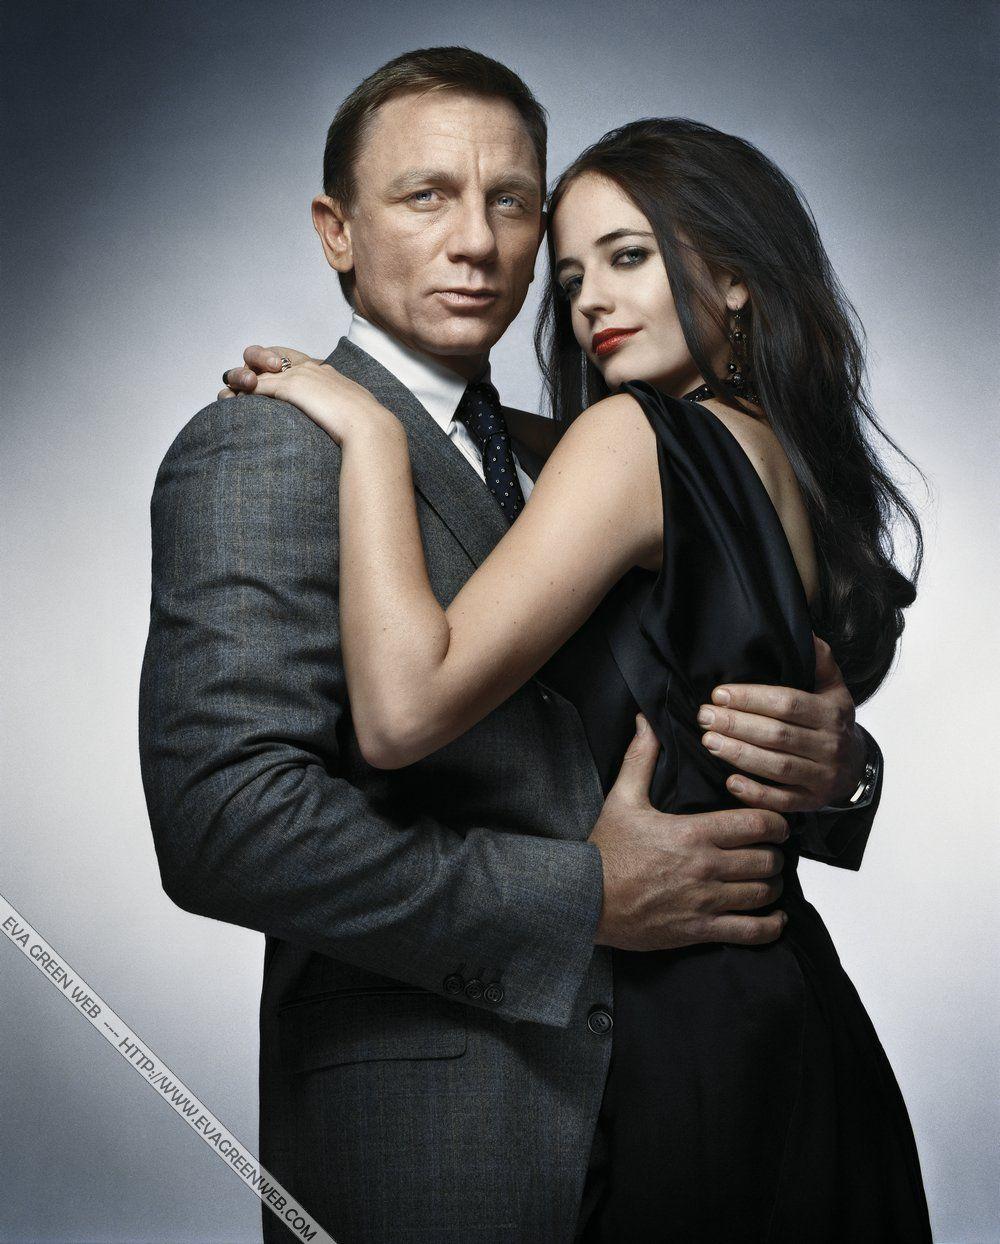 eva green daniel craig 007 casino royalle movies tv pinterest gute filme promis und singen. Black Bedroom Furniture Sets. Home Design Ideas